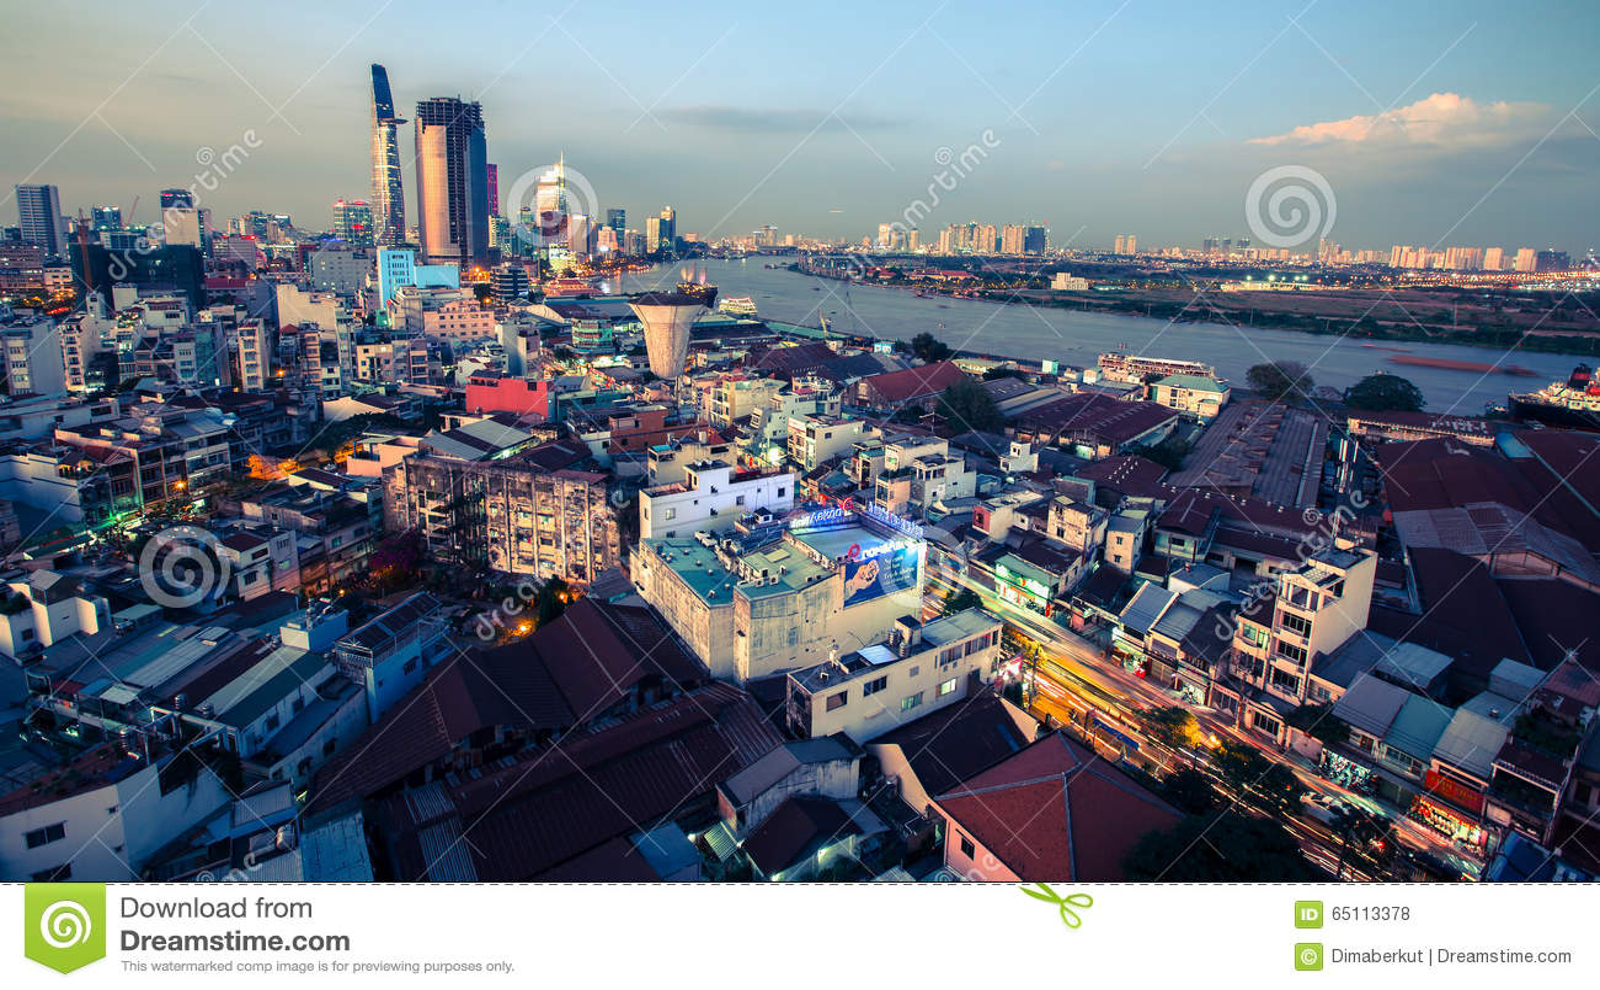 Web Design In Ho Chi Minh City